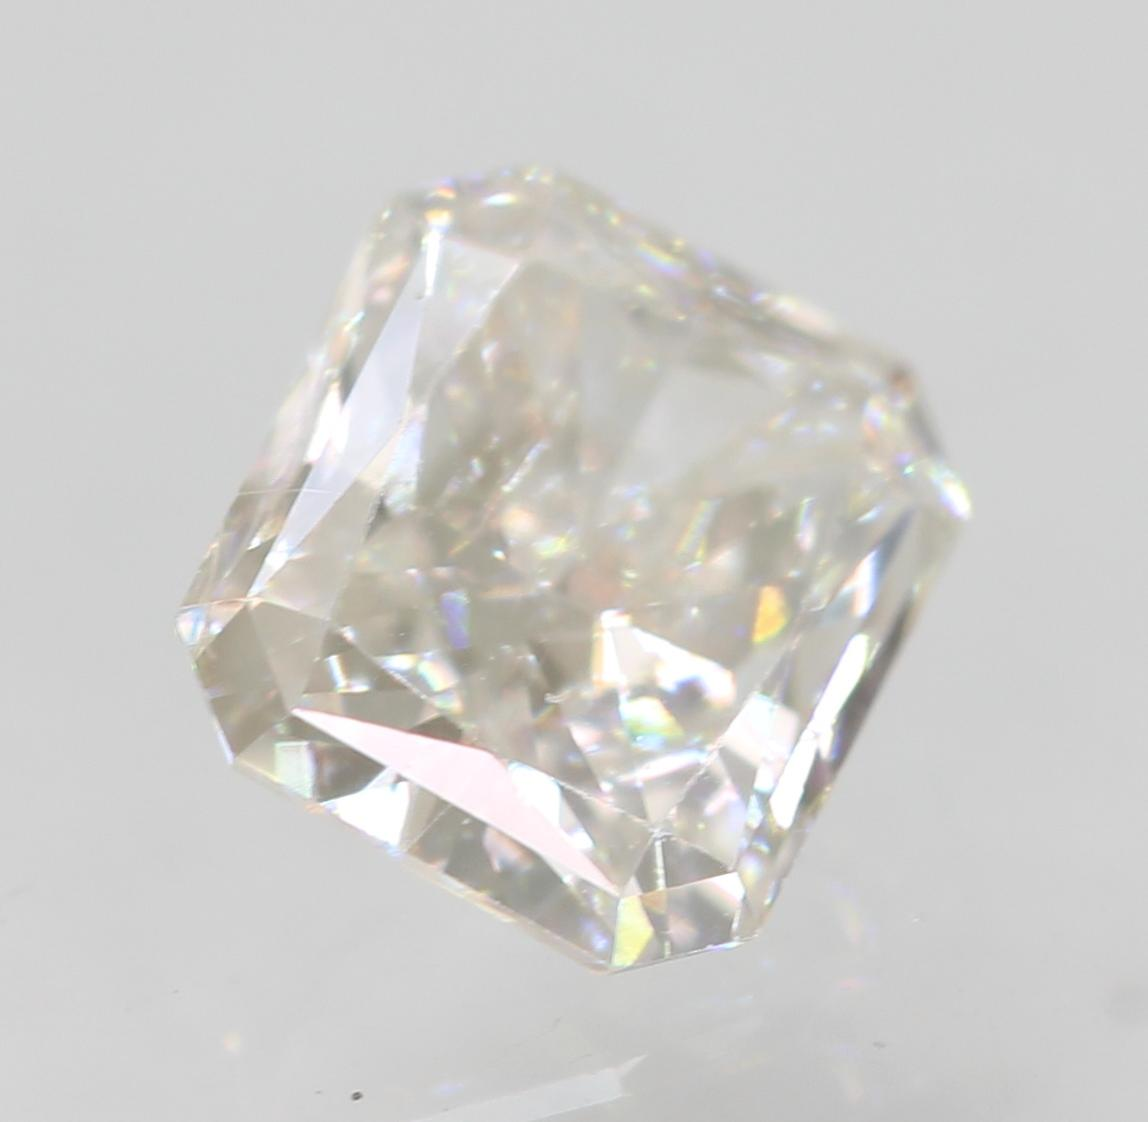 Certified 0.44 Carat E VVS2 Radiant Enhanced Natural Loose Diamond 4.88x4.16mm